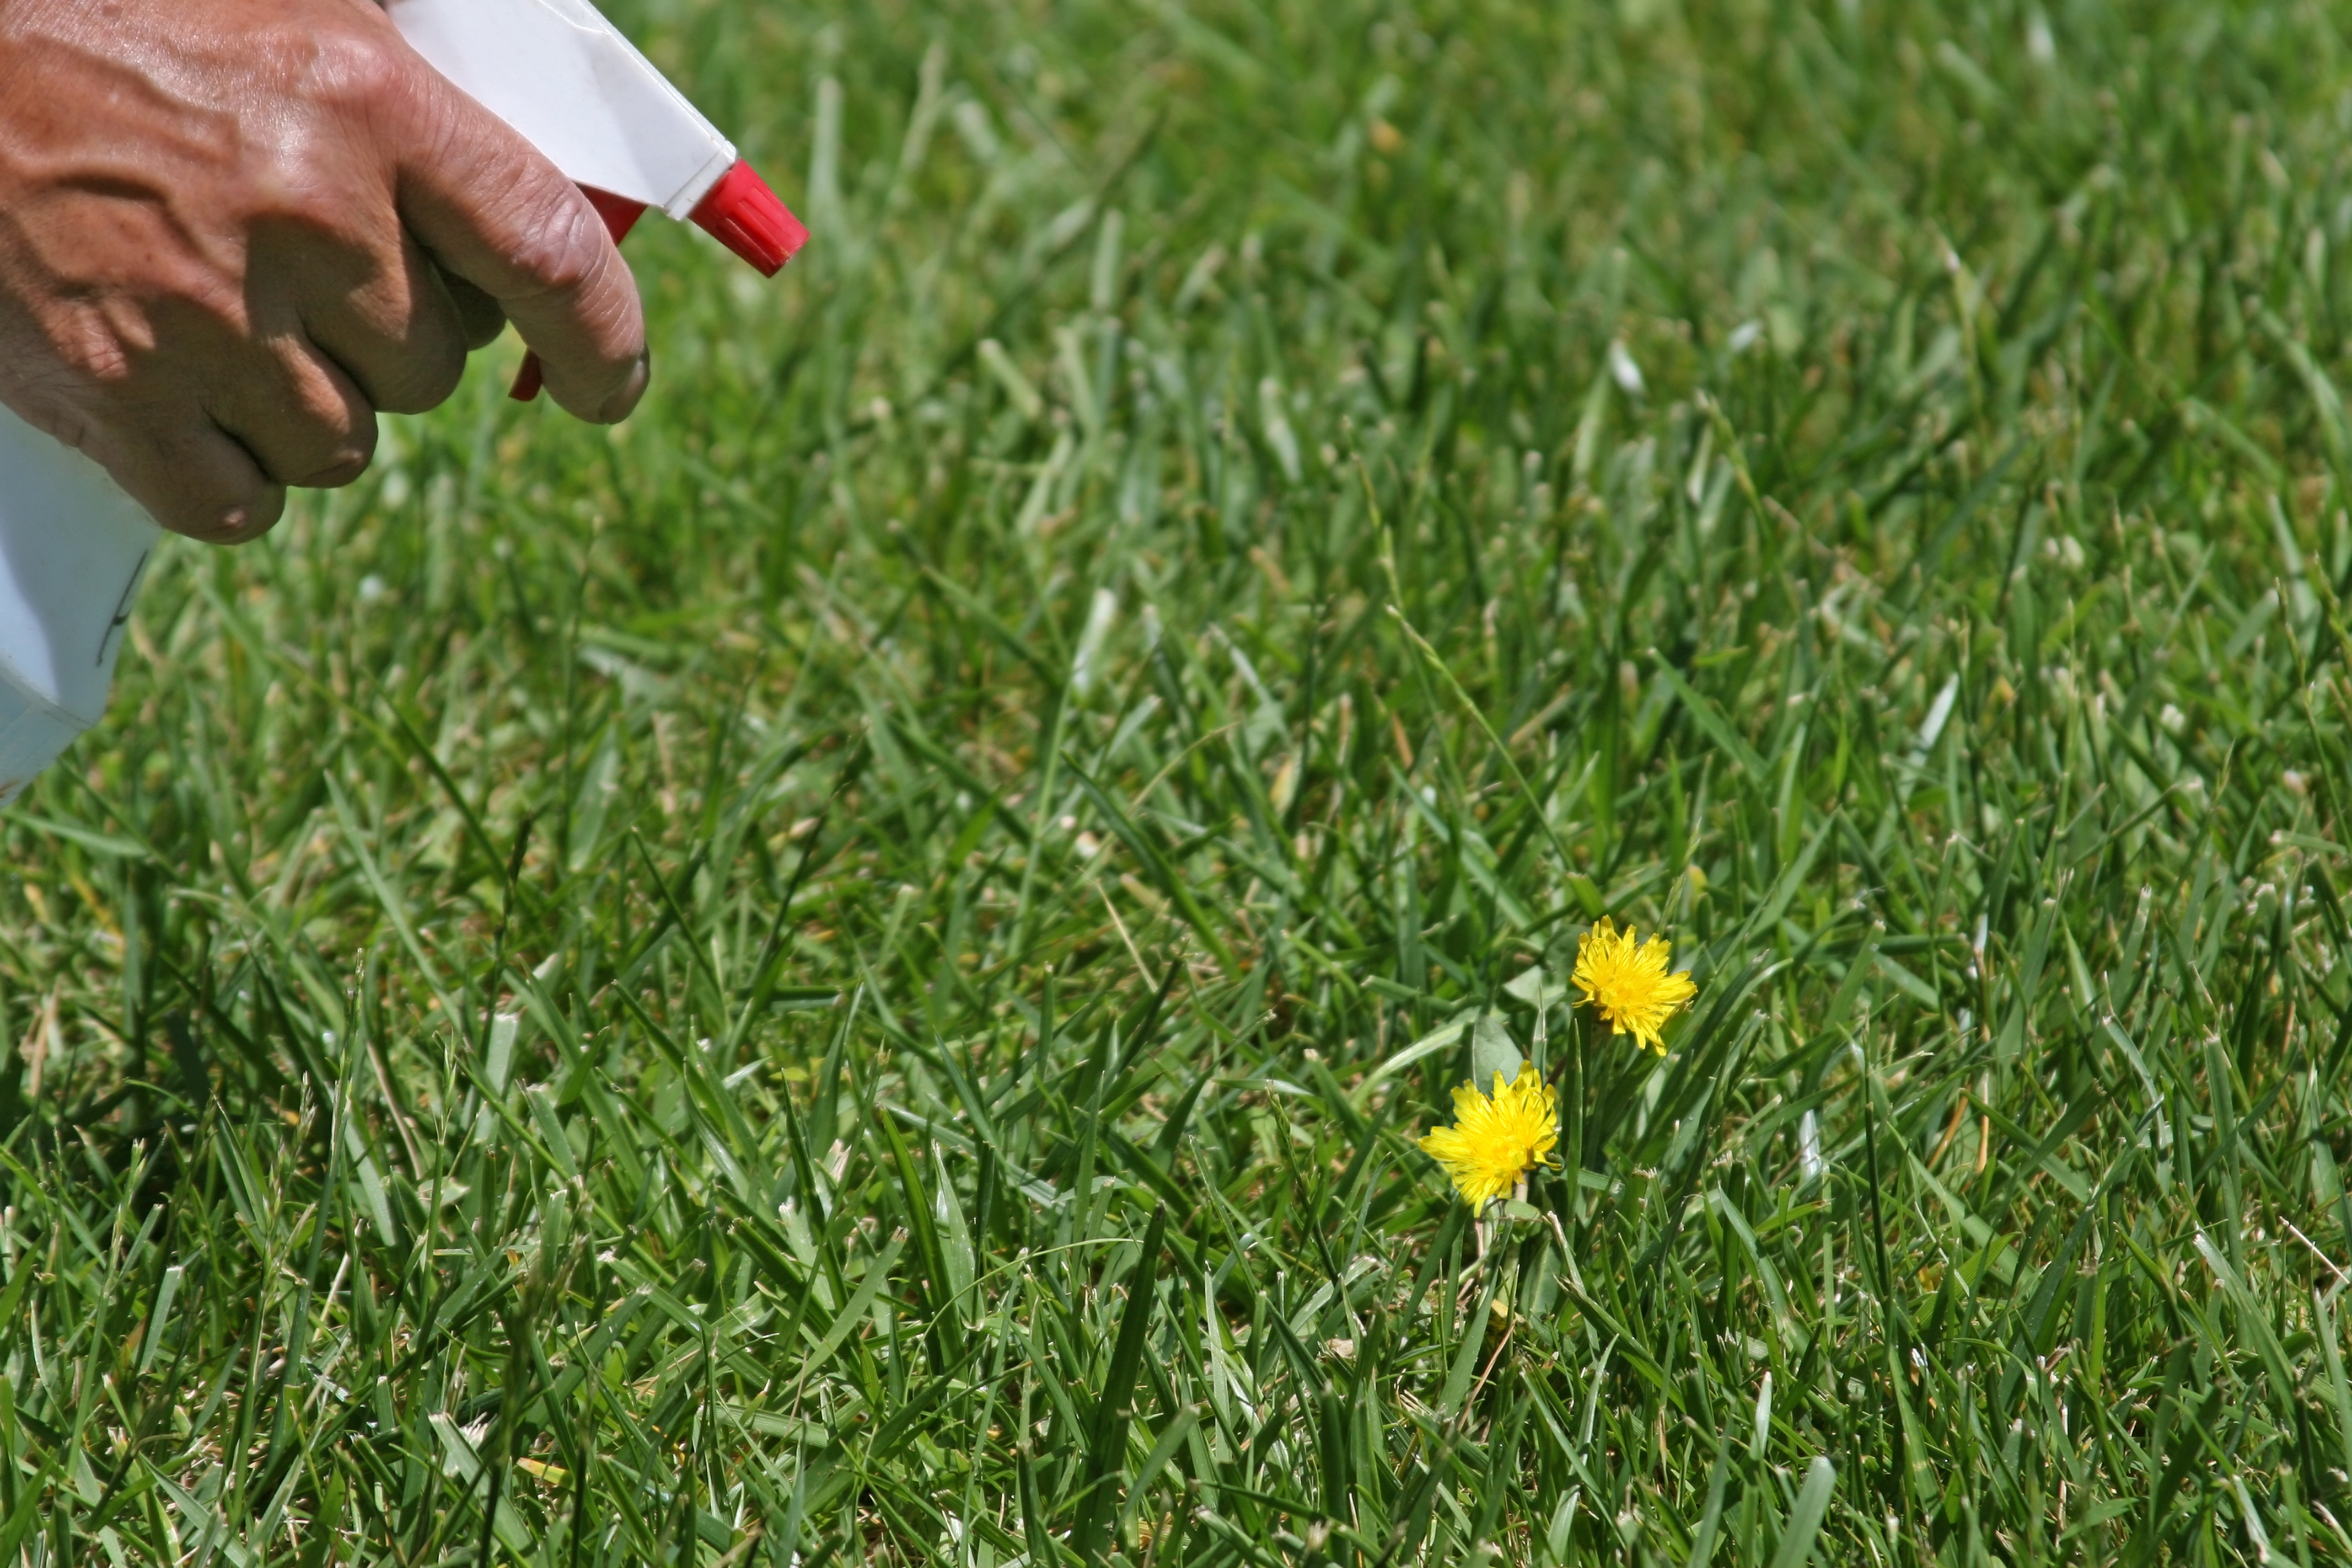 Weeds in flower beds herbicide - Weeds In Flower Beds Herbicide 25